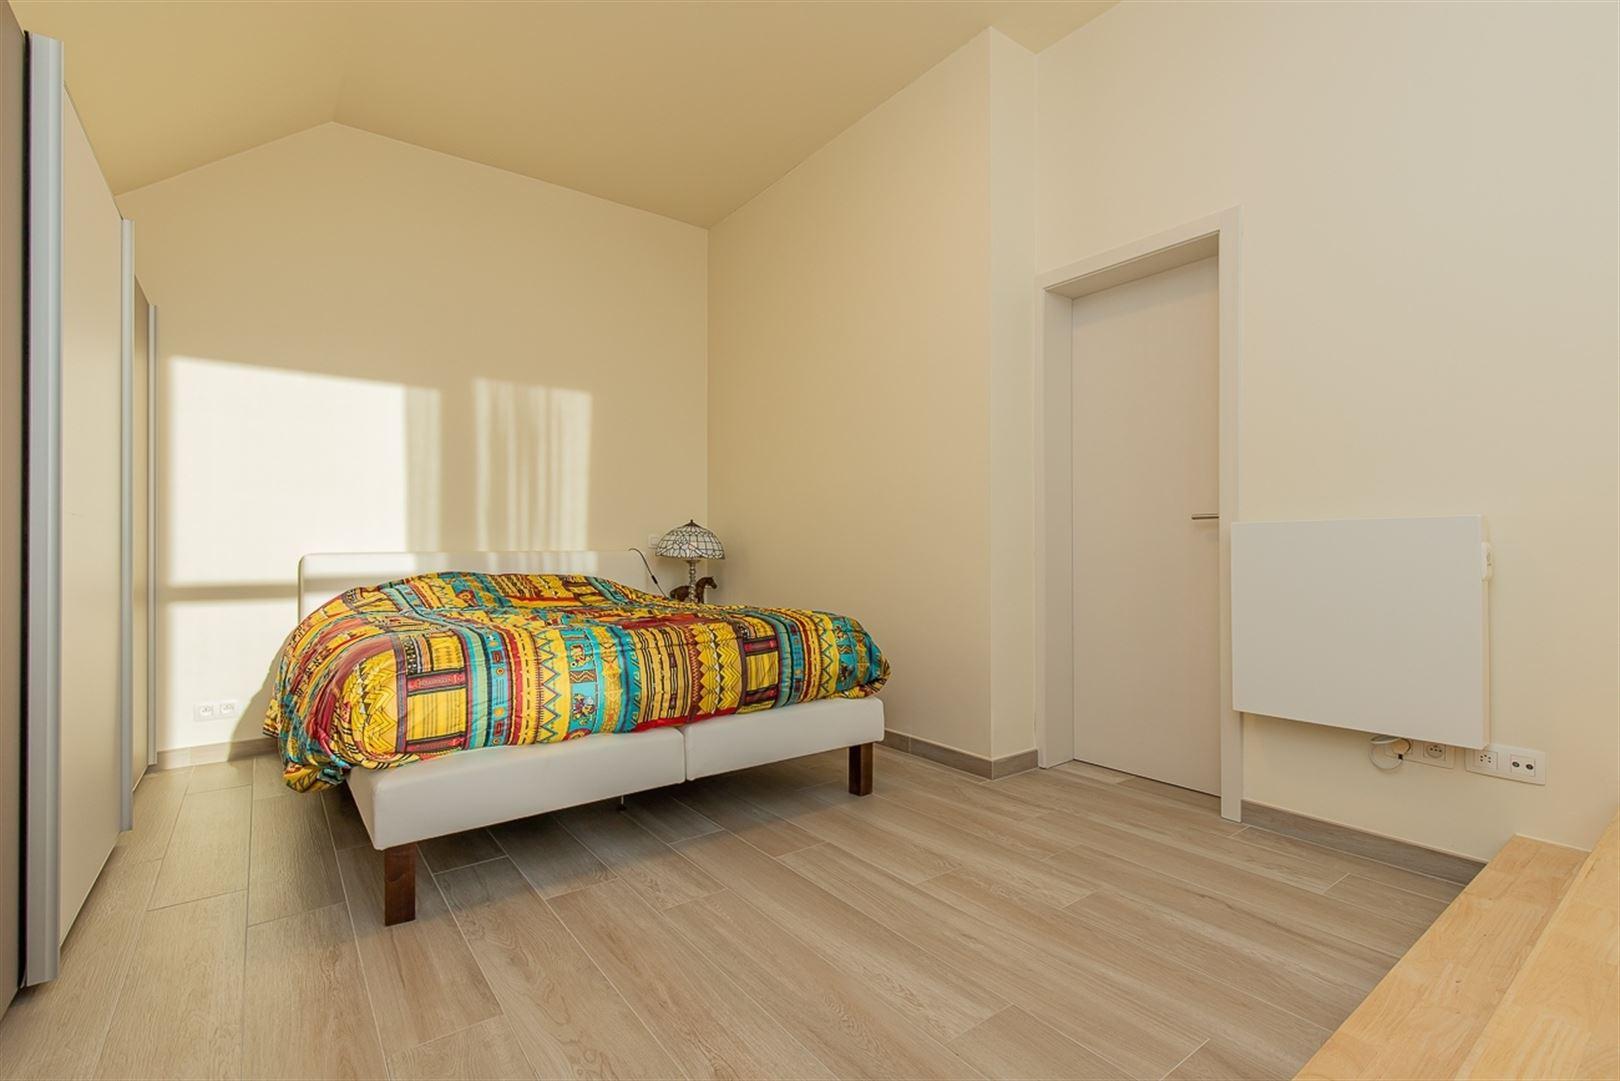 Foto 13 : Duplex/Penthouse te 9200 DENDERMONDE (België) - Prijs € 399.000